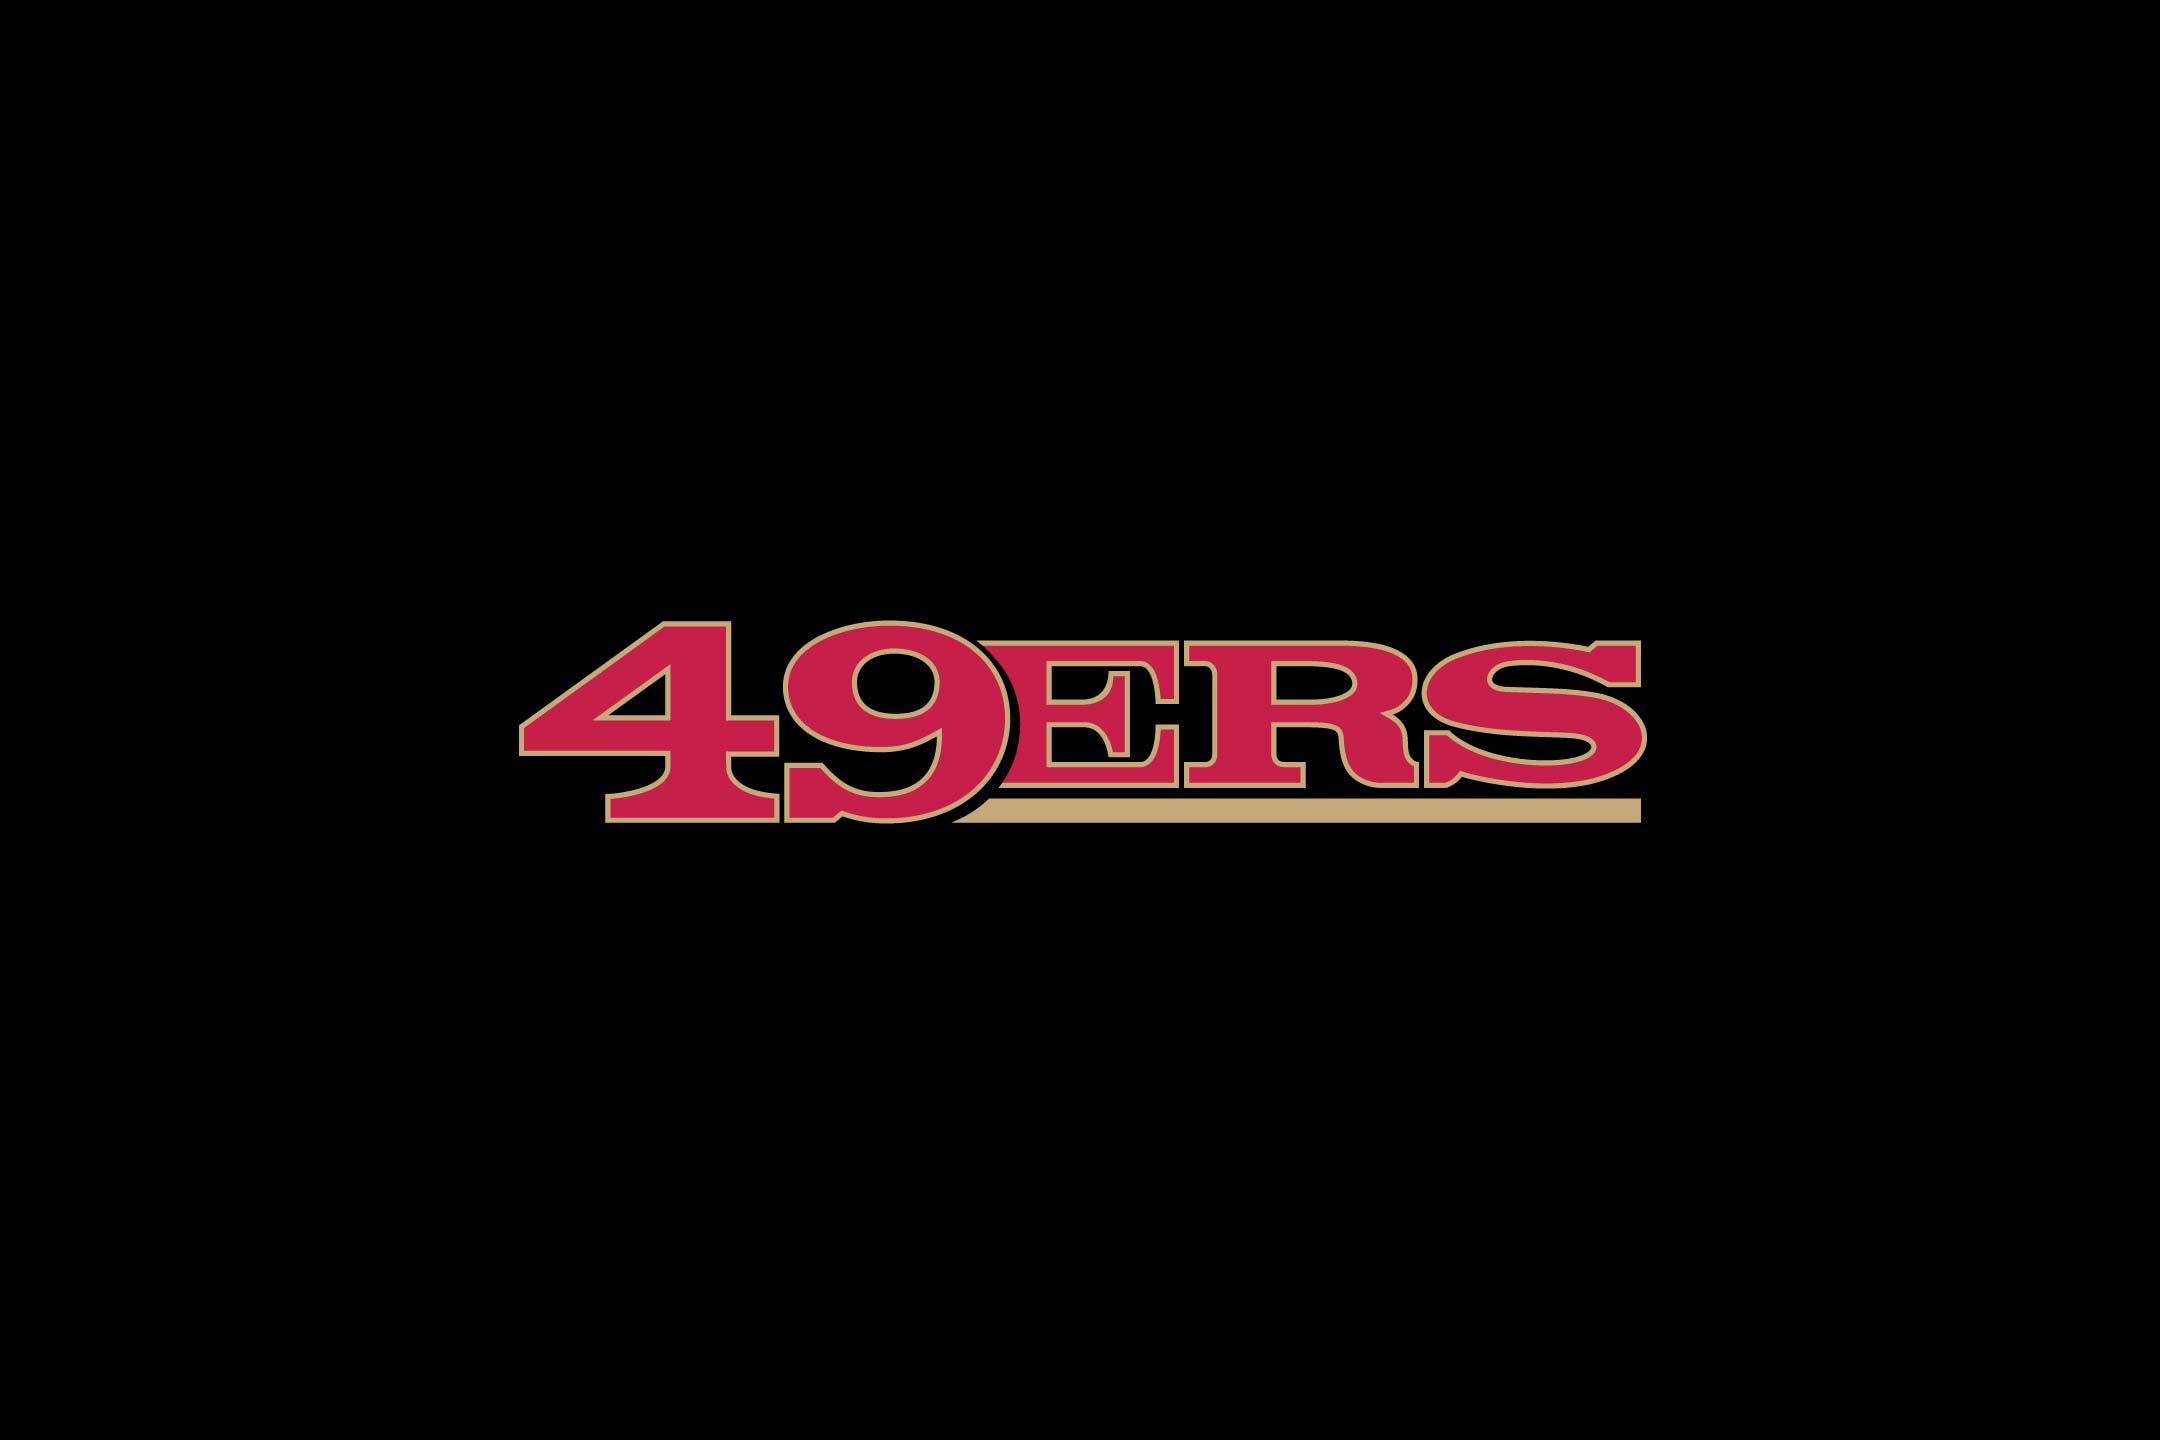 SAN FRANCISCO 49ers nfl football f wallpaper background 2160x1440